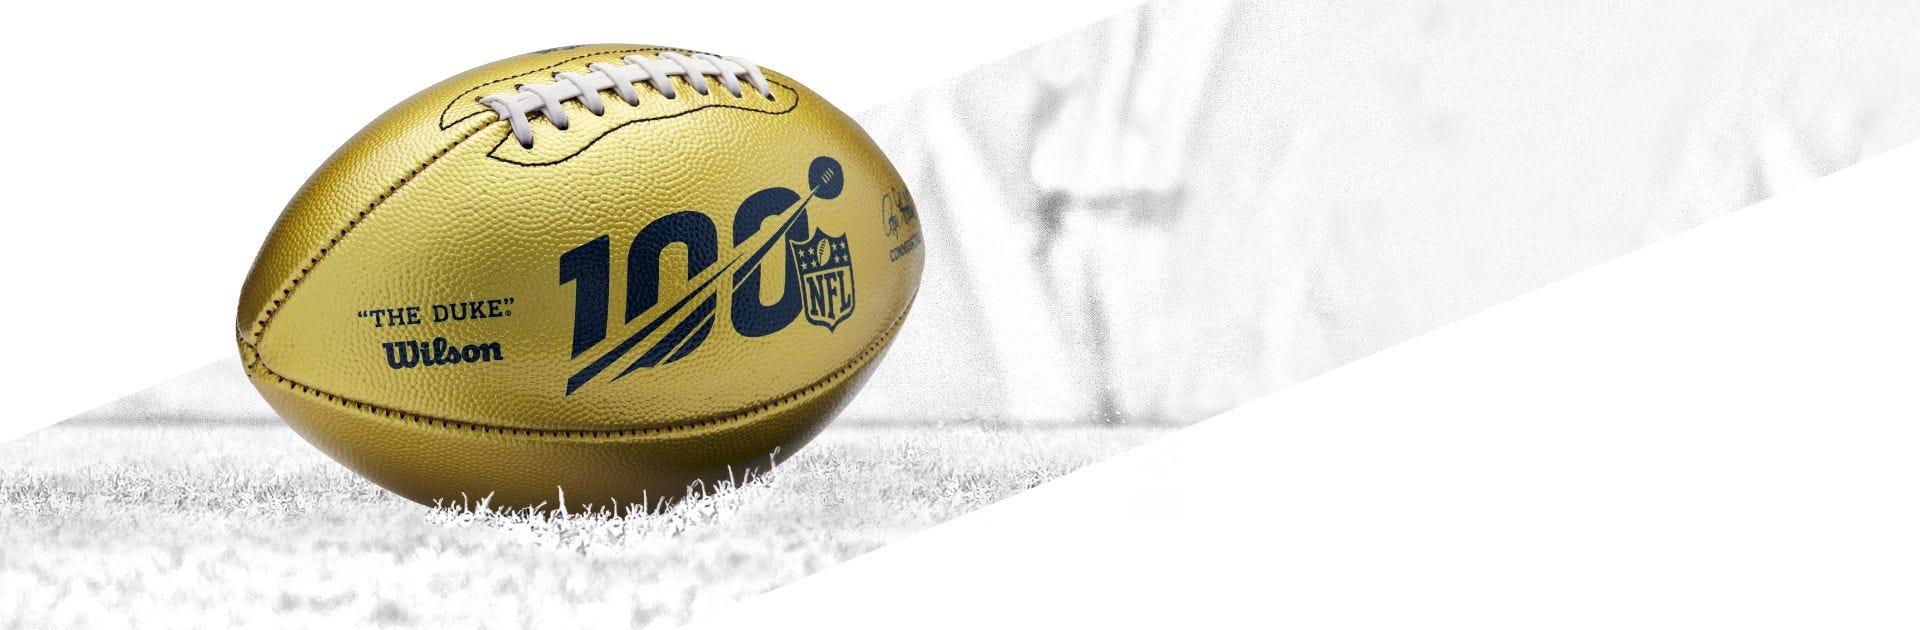 NFL Gold Football